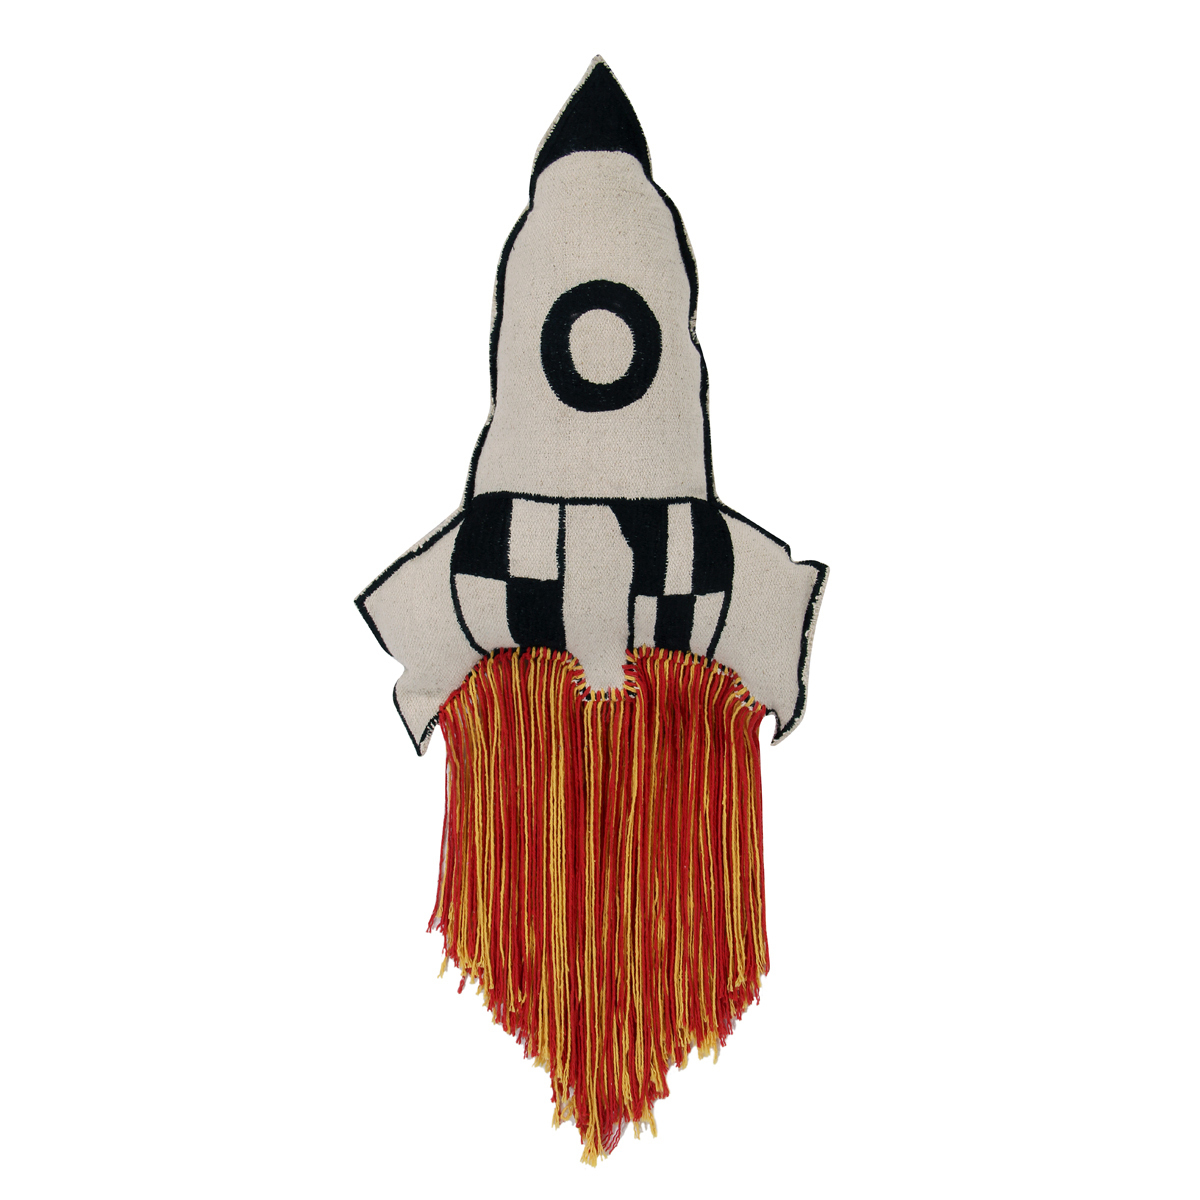 Coussin Coussin Rocket Coussin Rocket